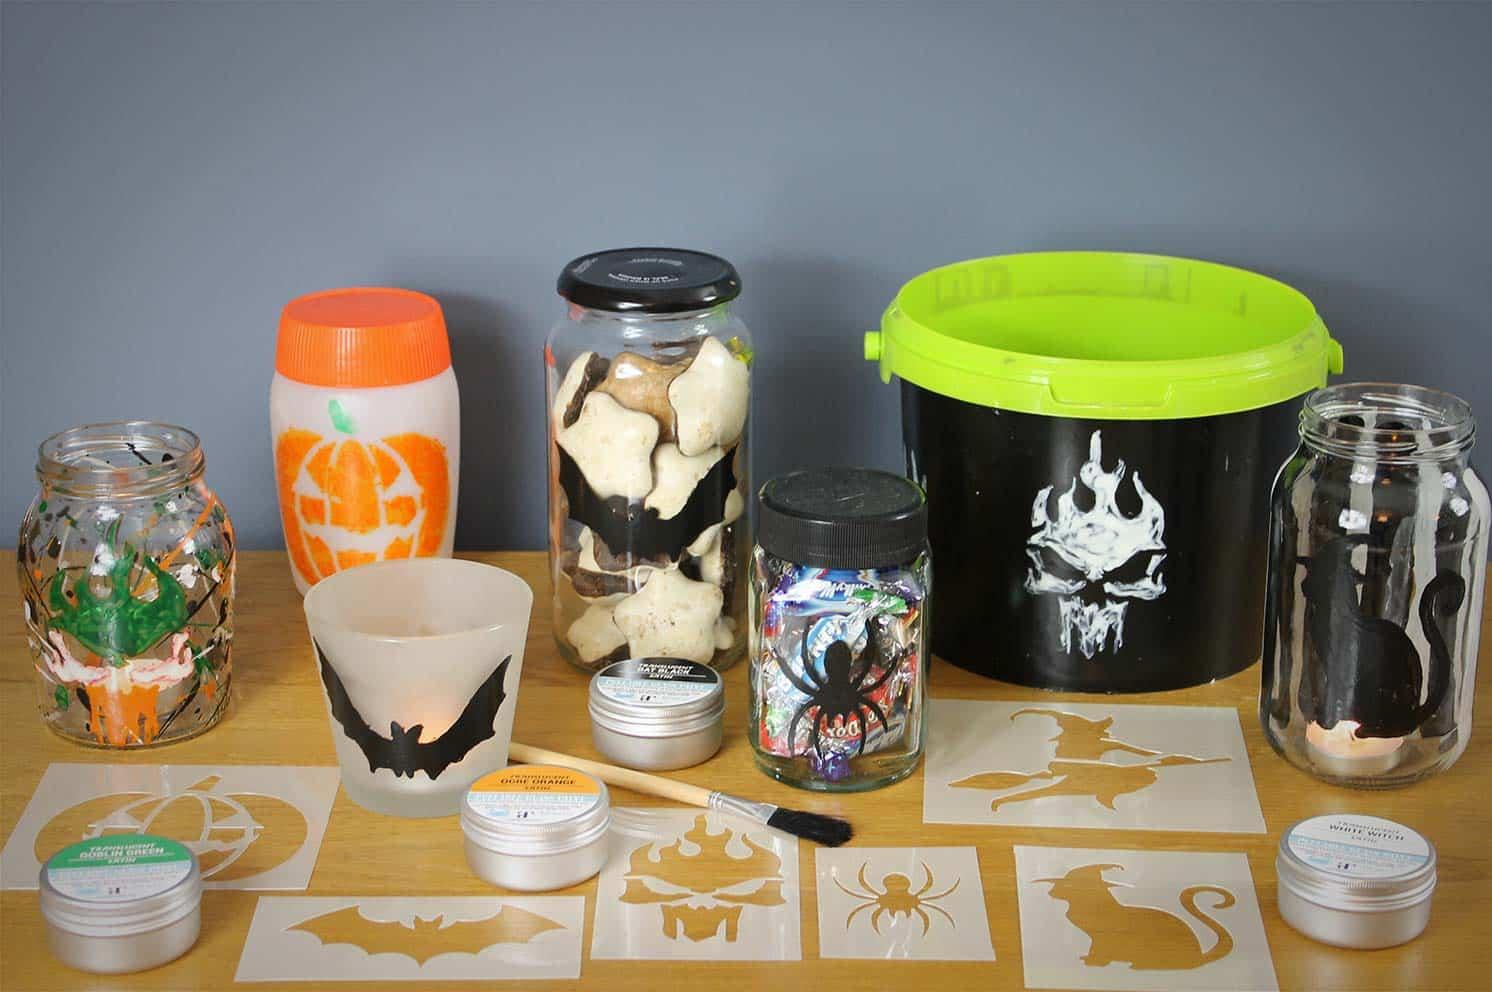 Thorndown-Paint-Halloween-Craft-Pack-Blog-Post-Header